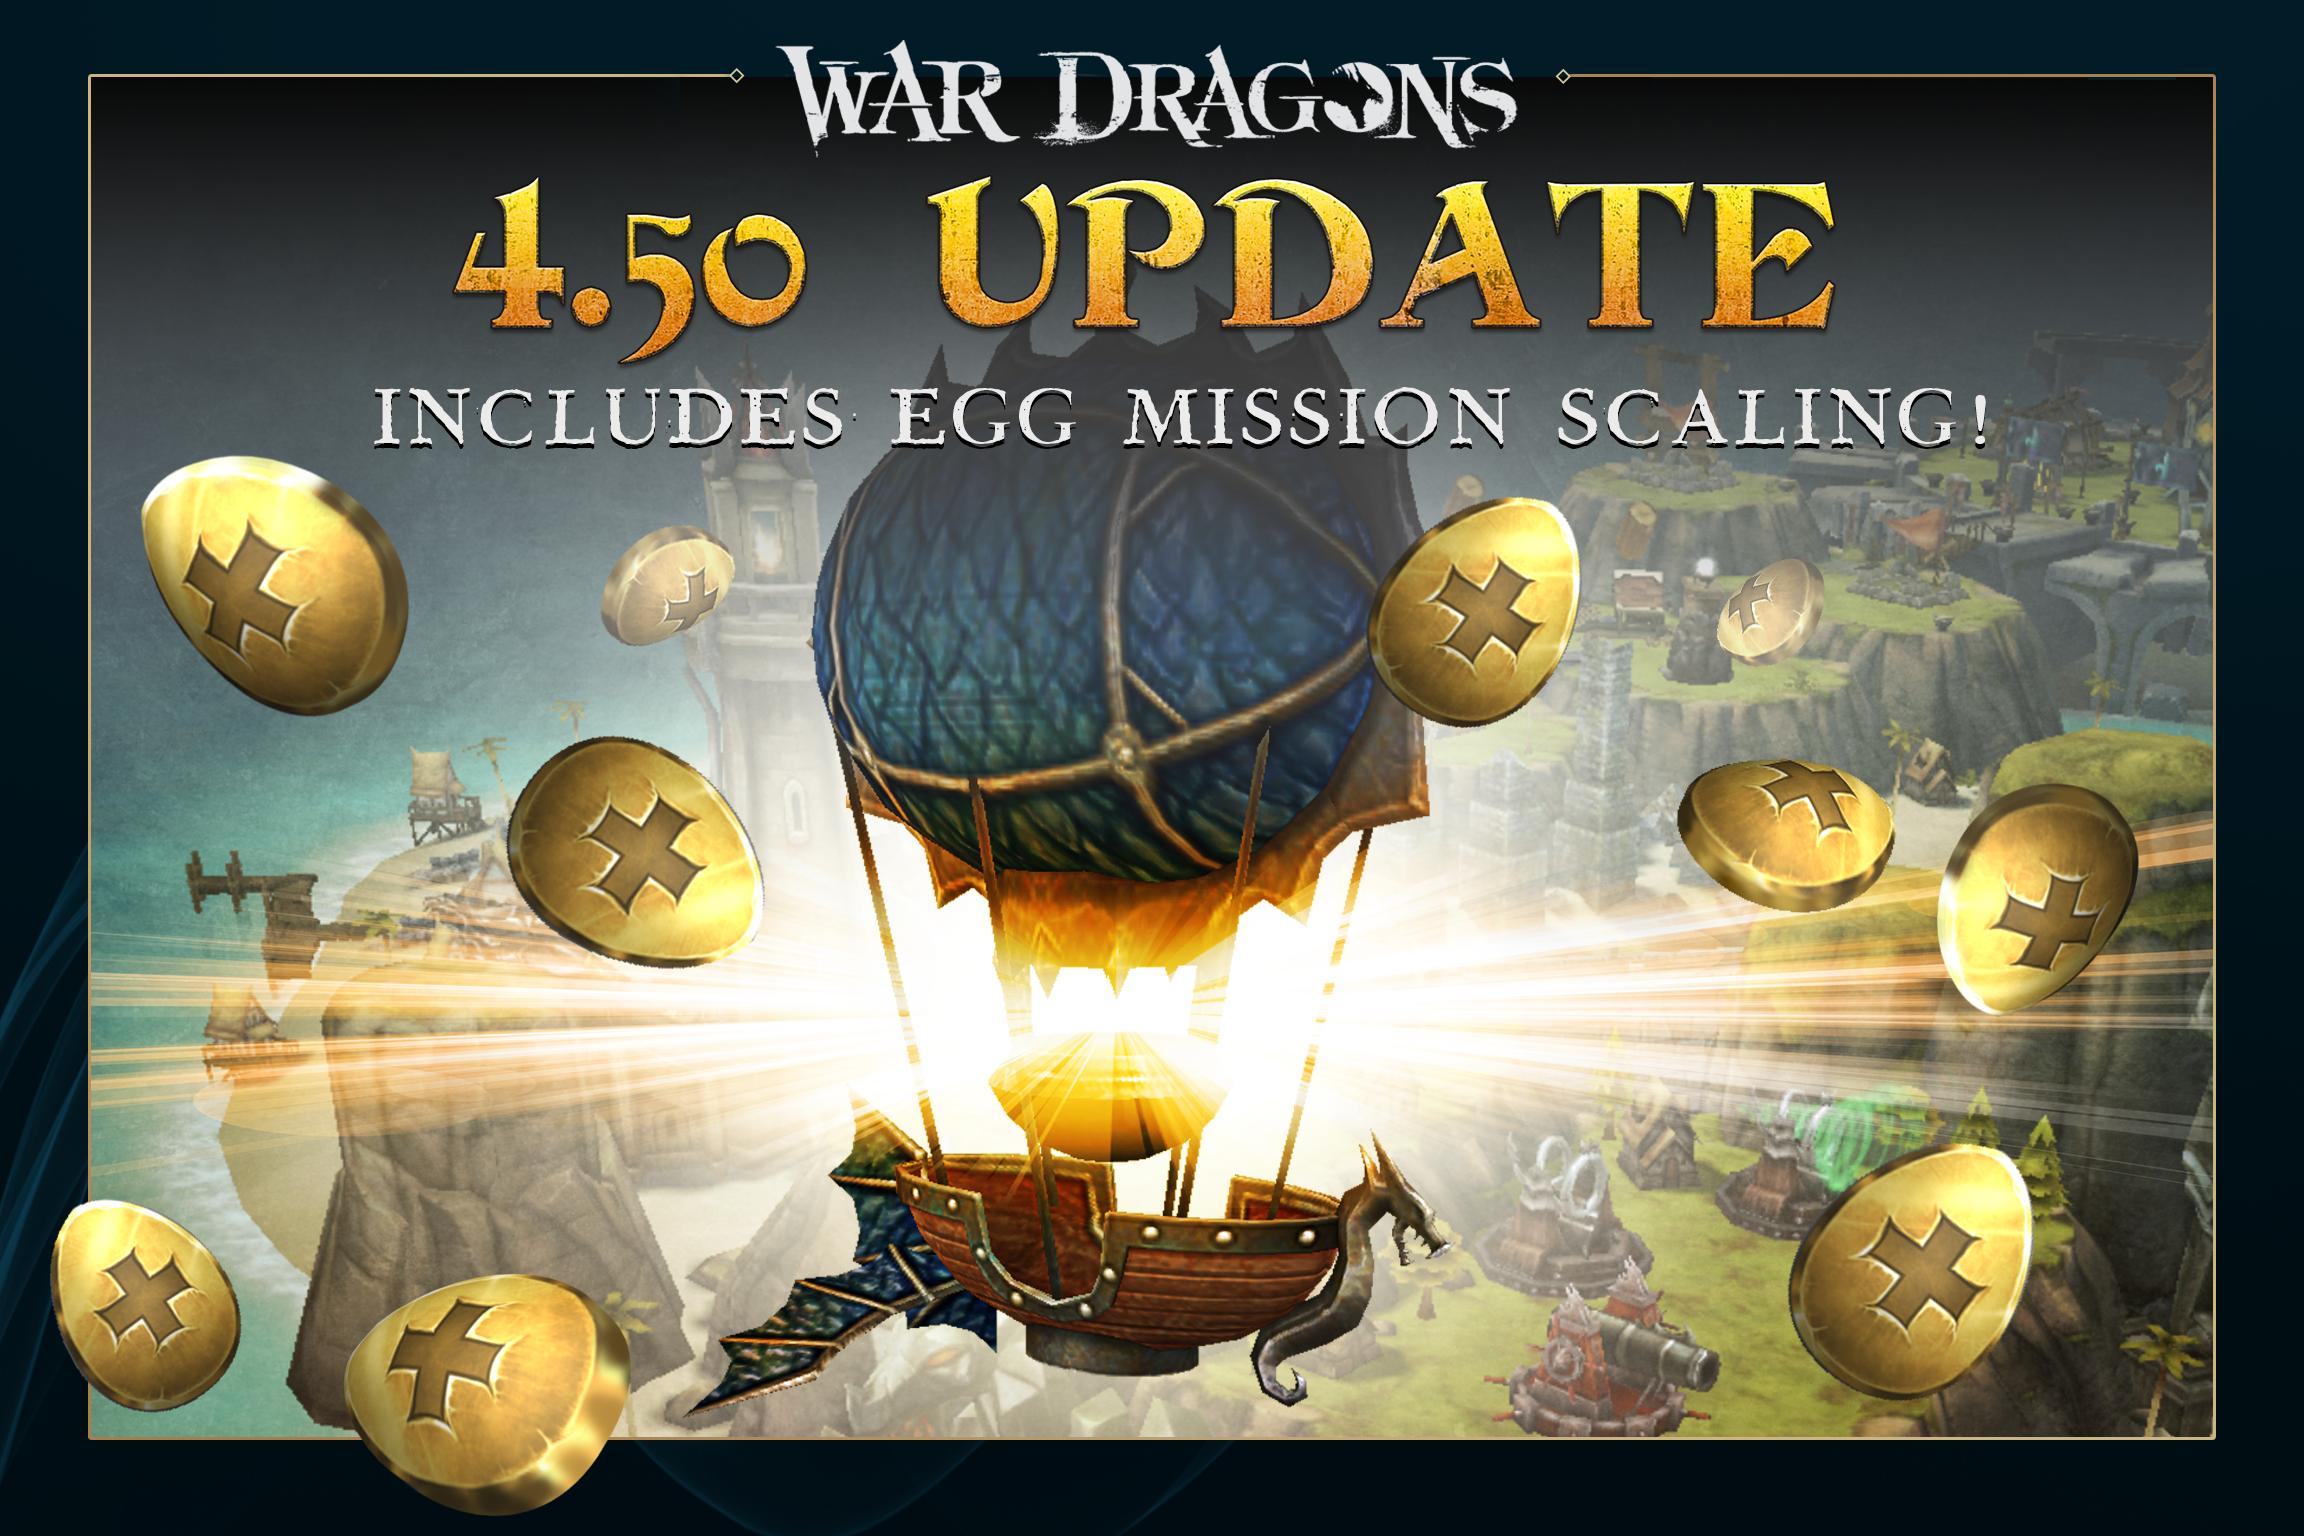 War Dragons - Egg Mission Scaling